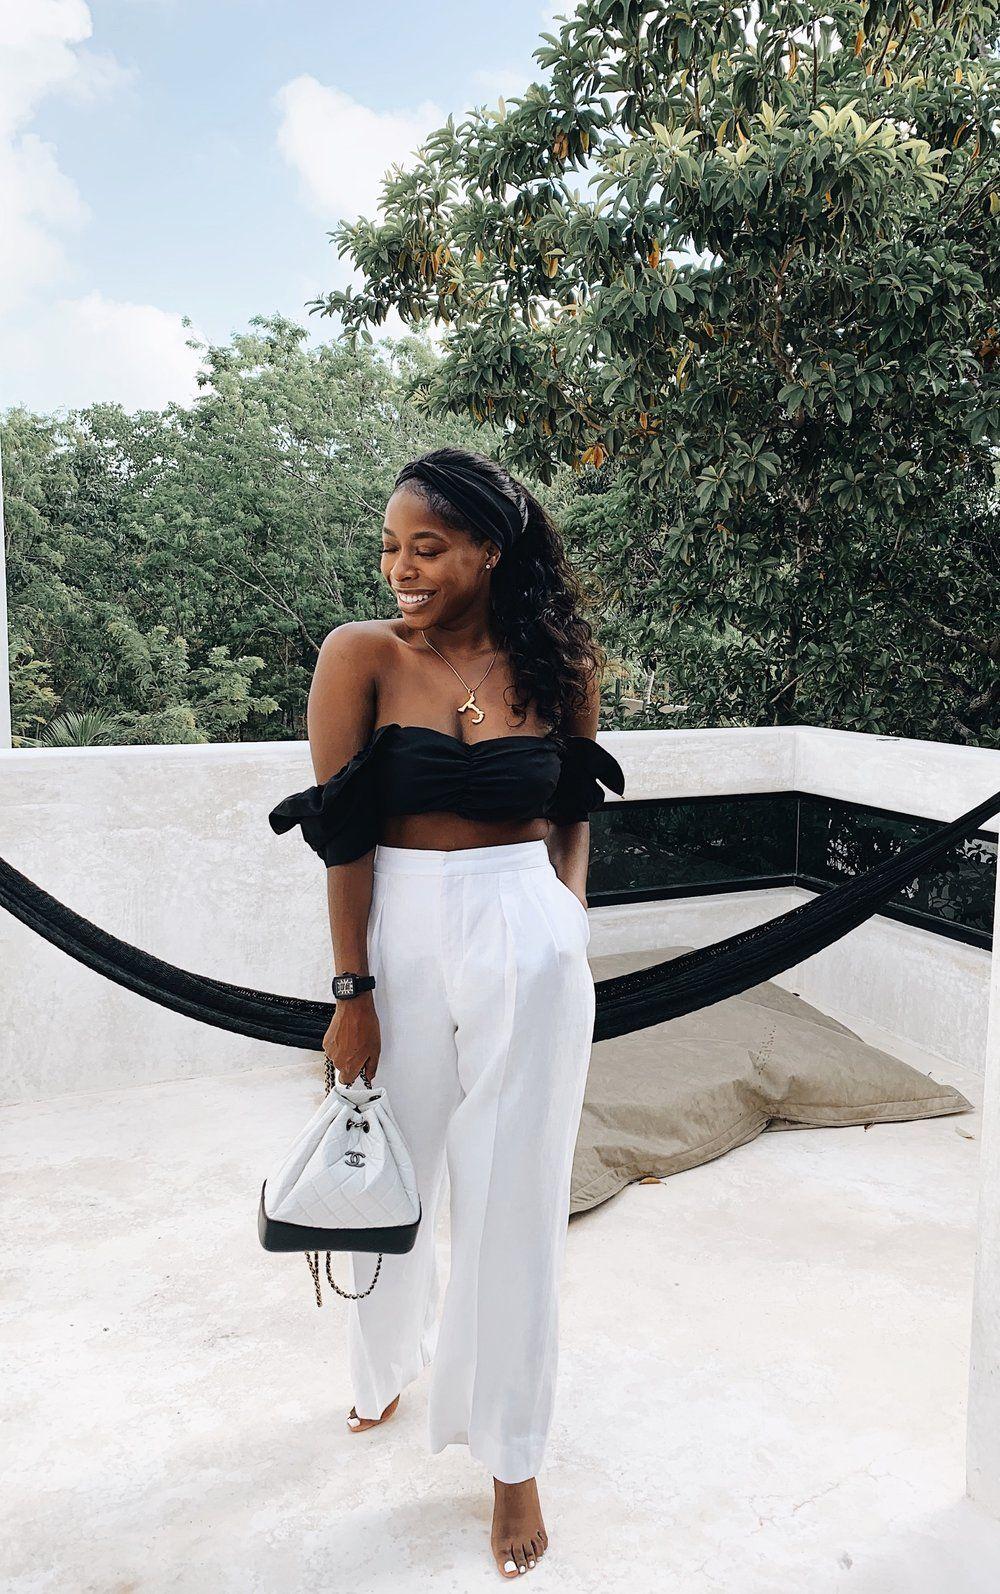 Dakar White Femeie dating Iubirea site- ului de dating in Fran? a